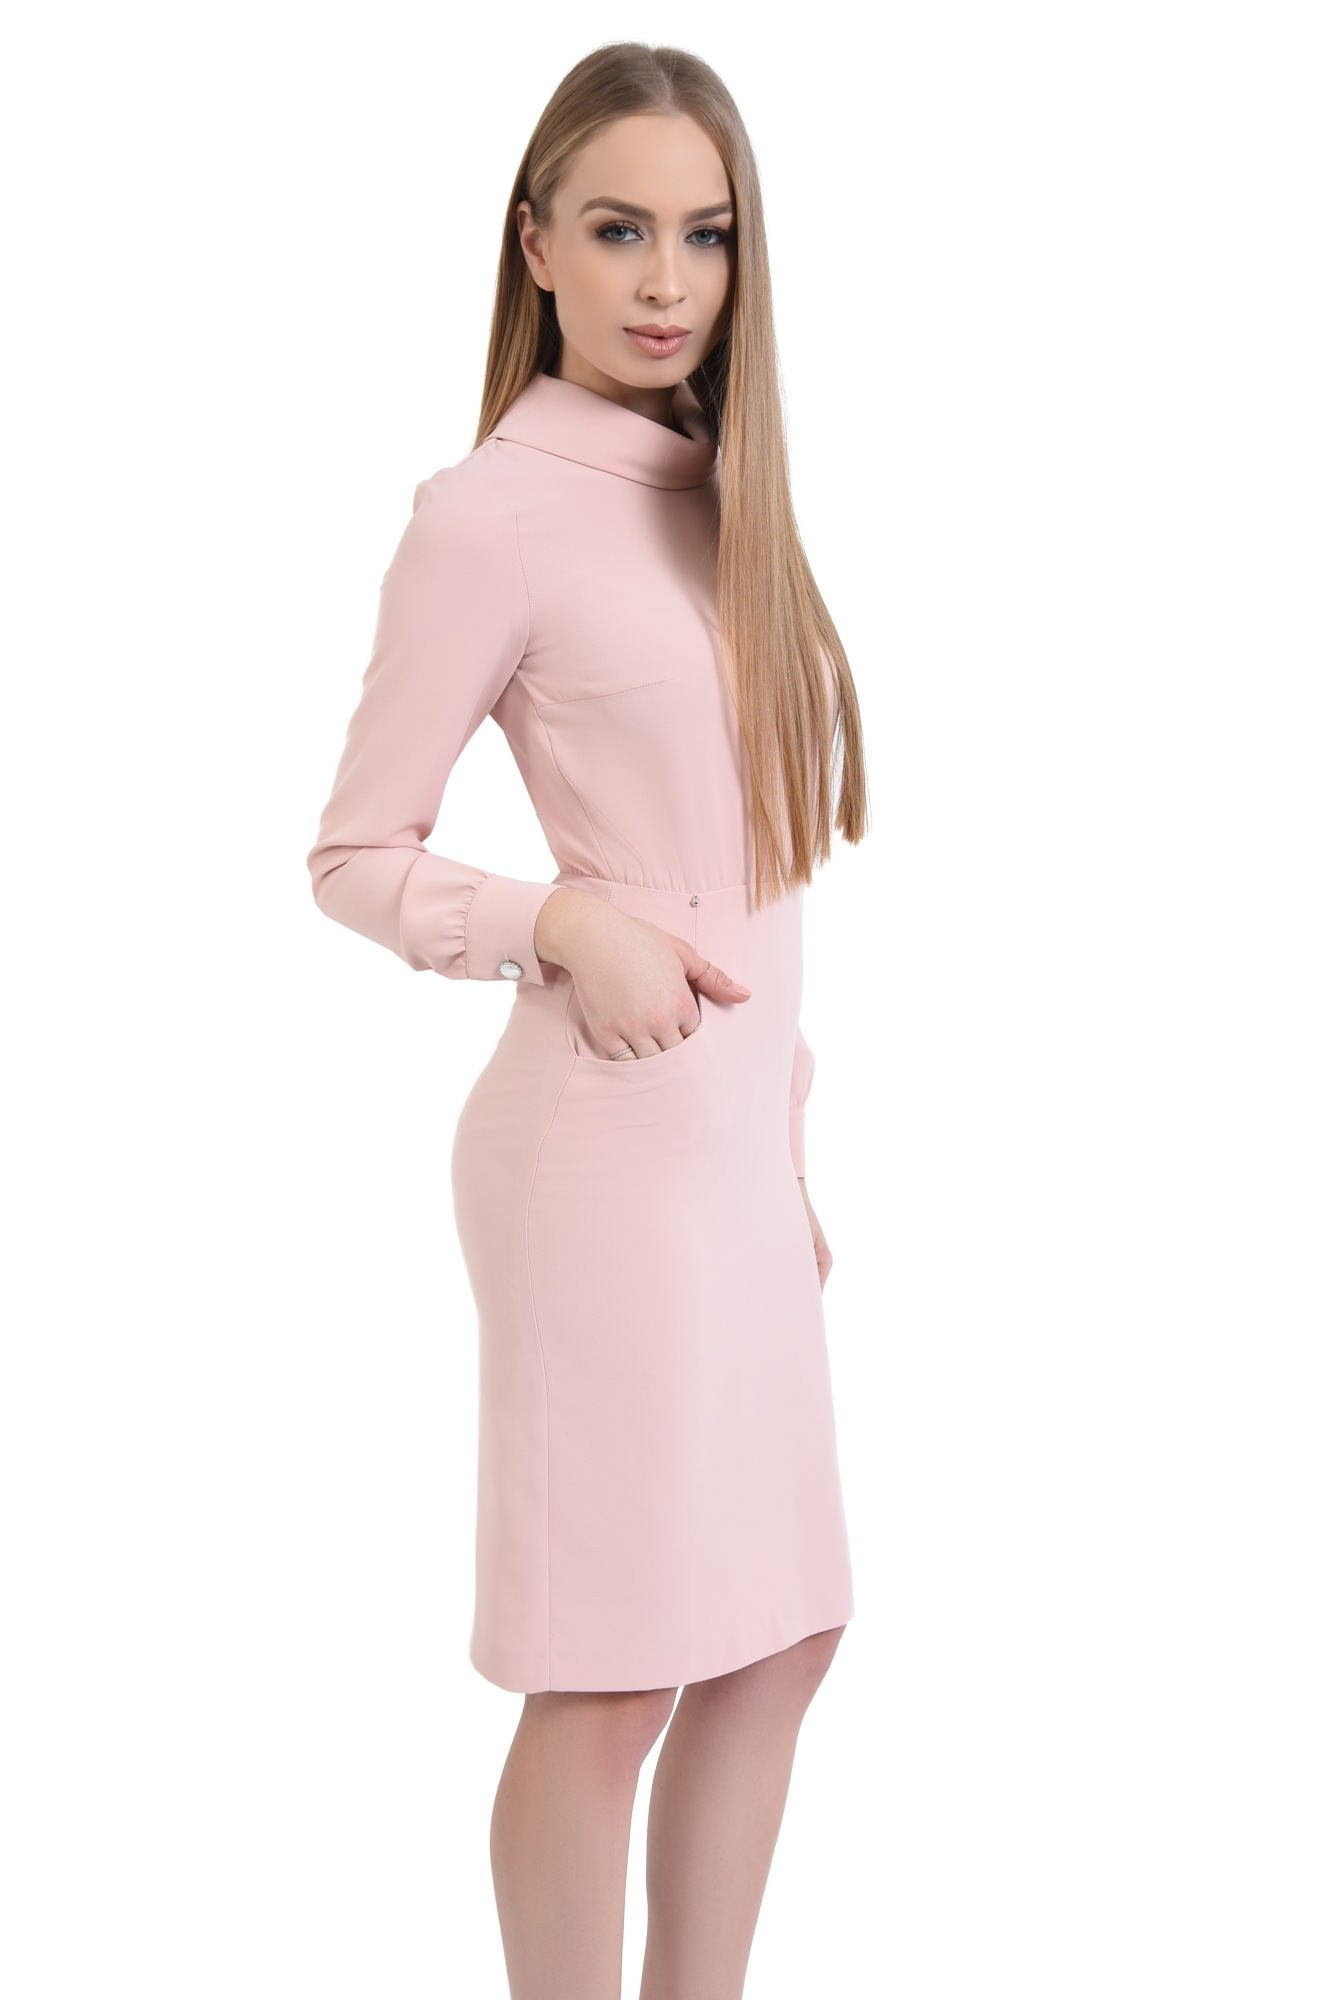 0 - Rochie casual, roz